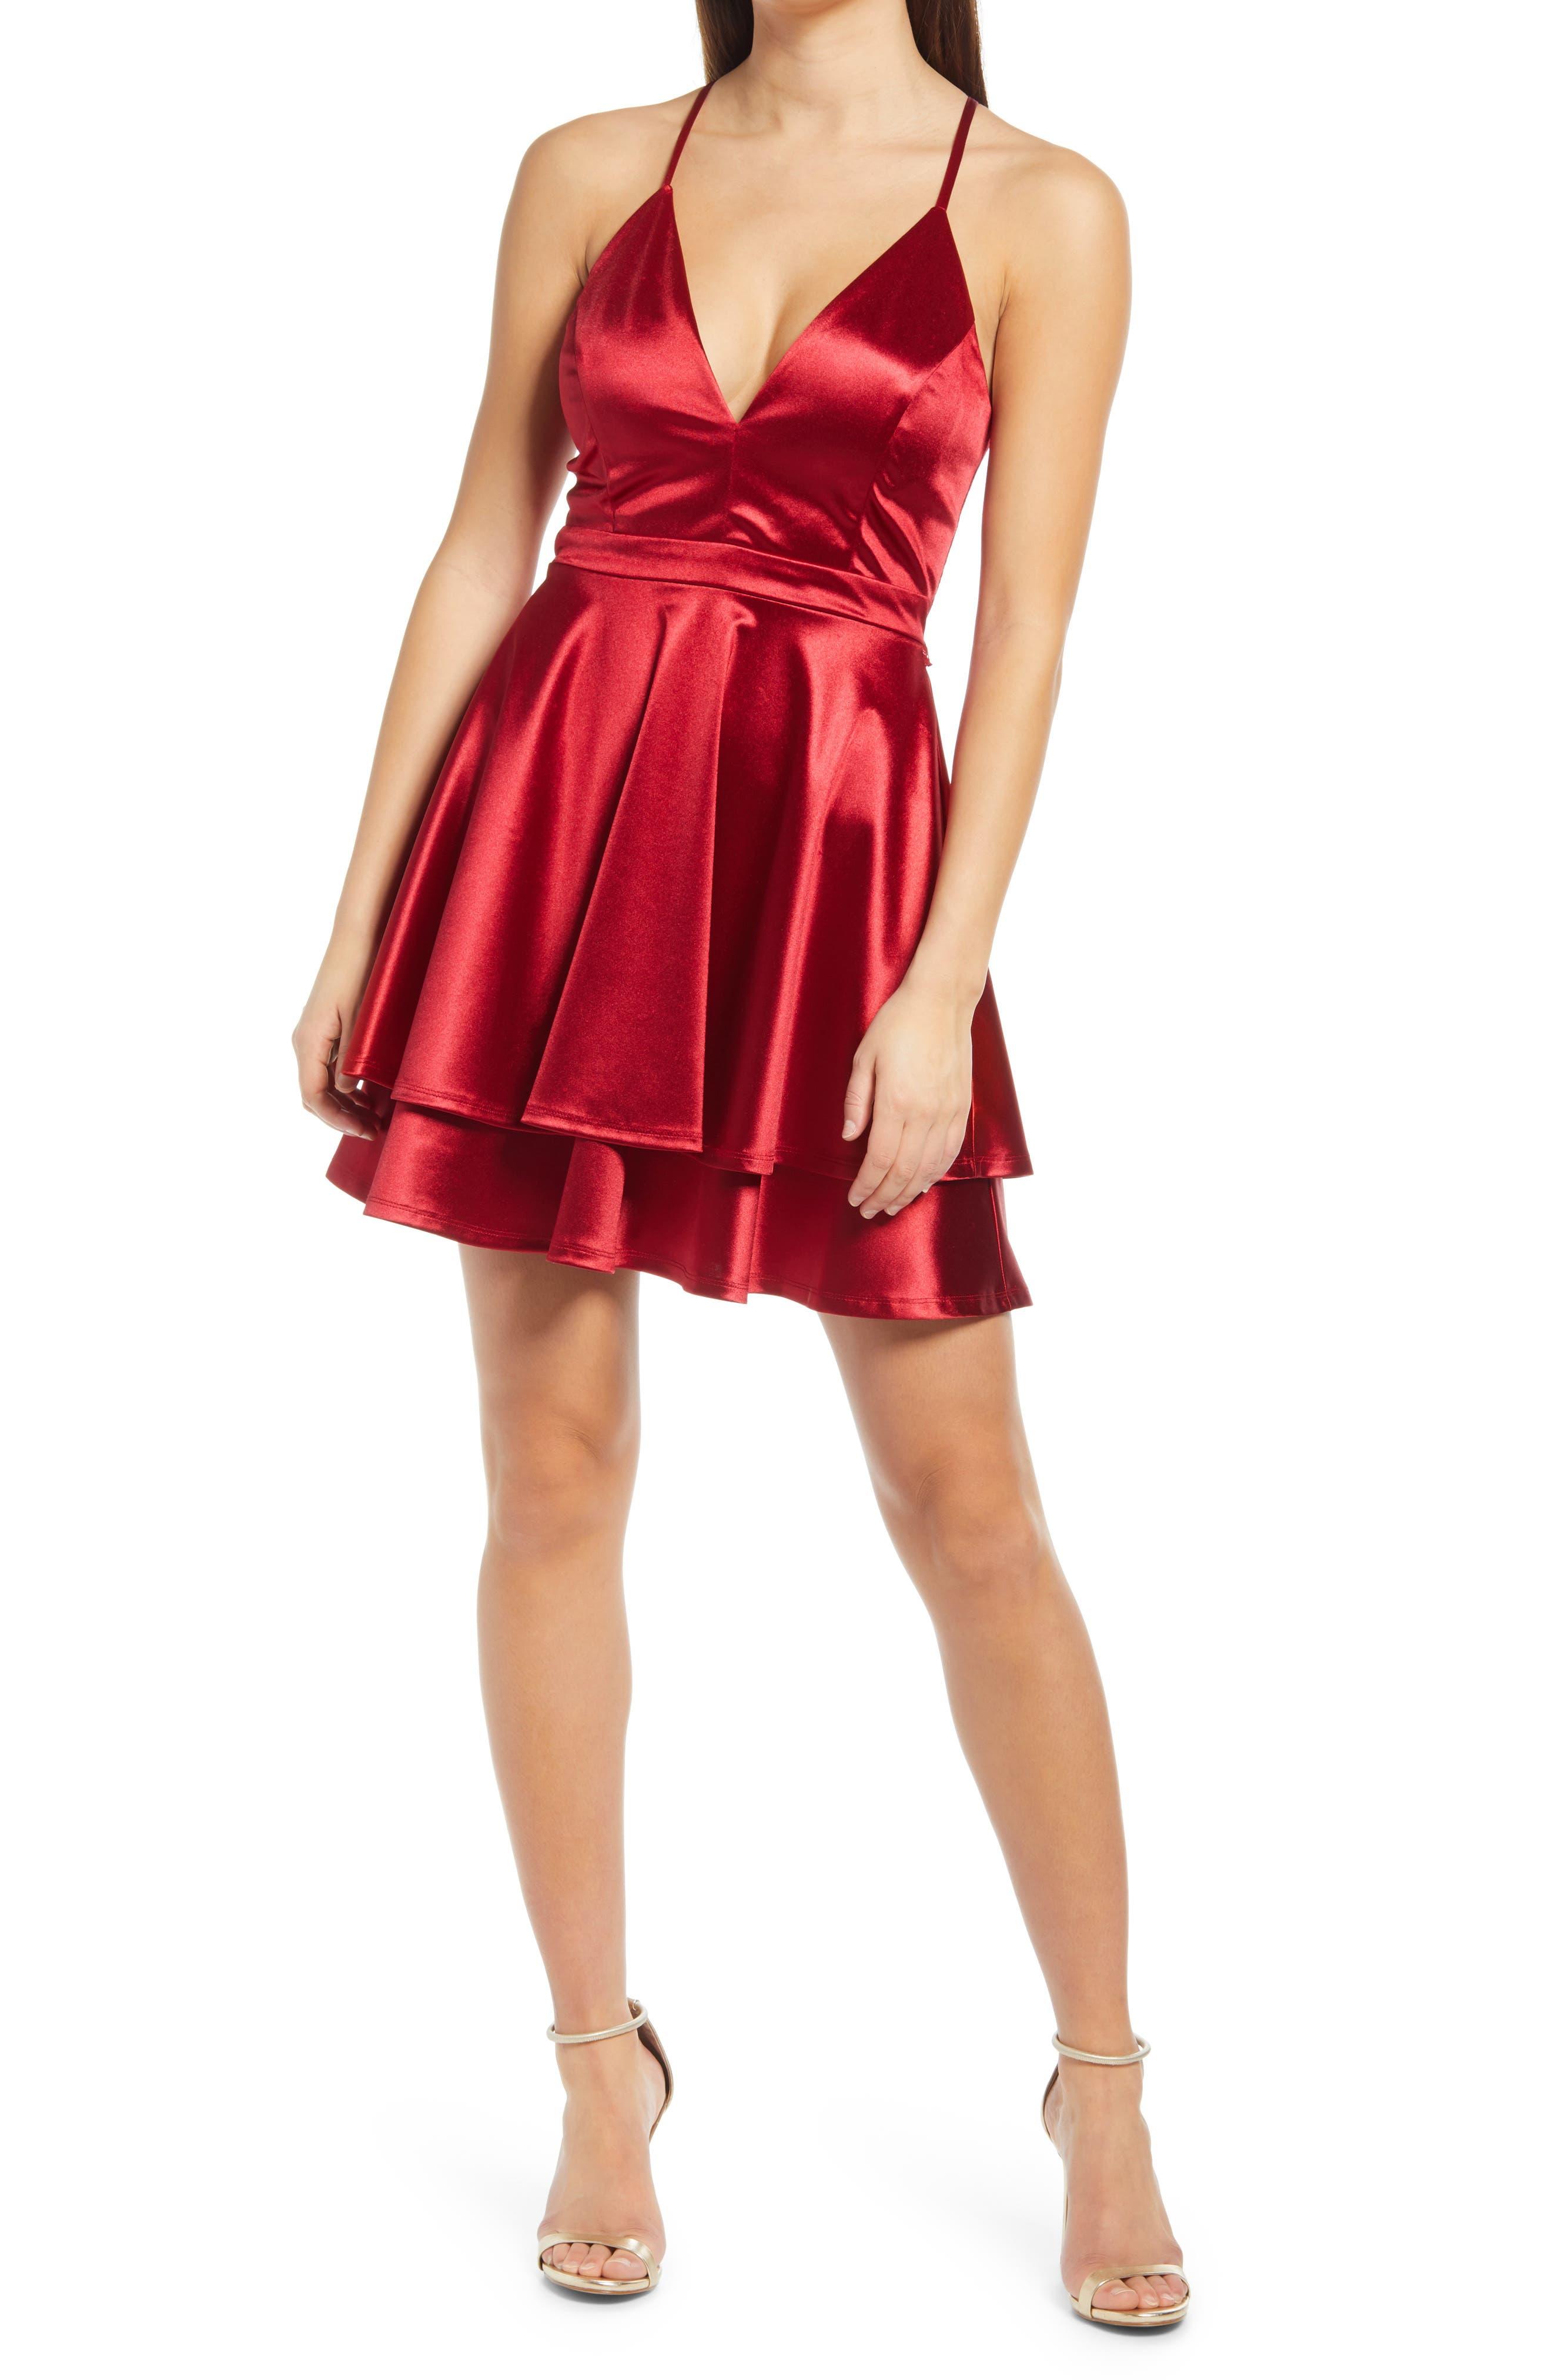 Lace Back Skater Dress